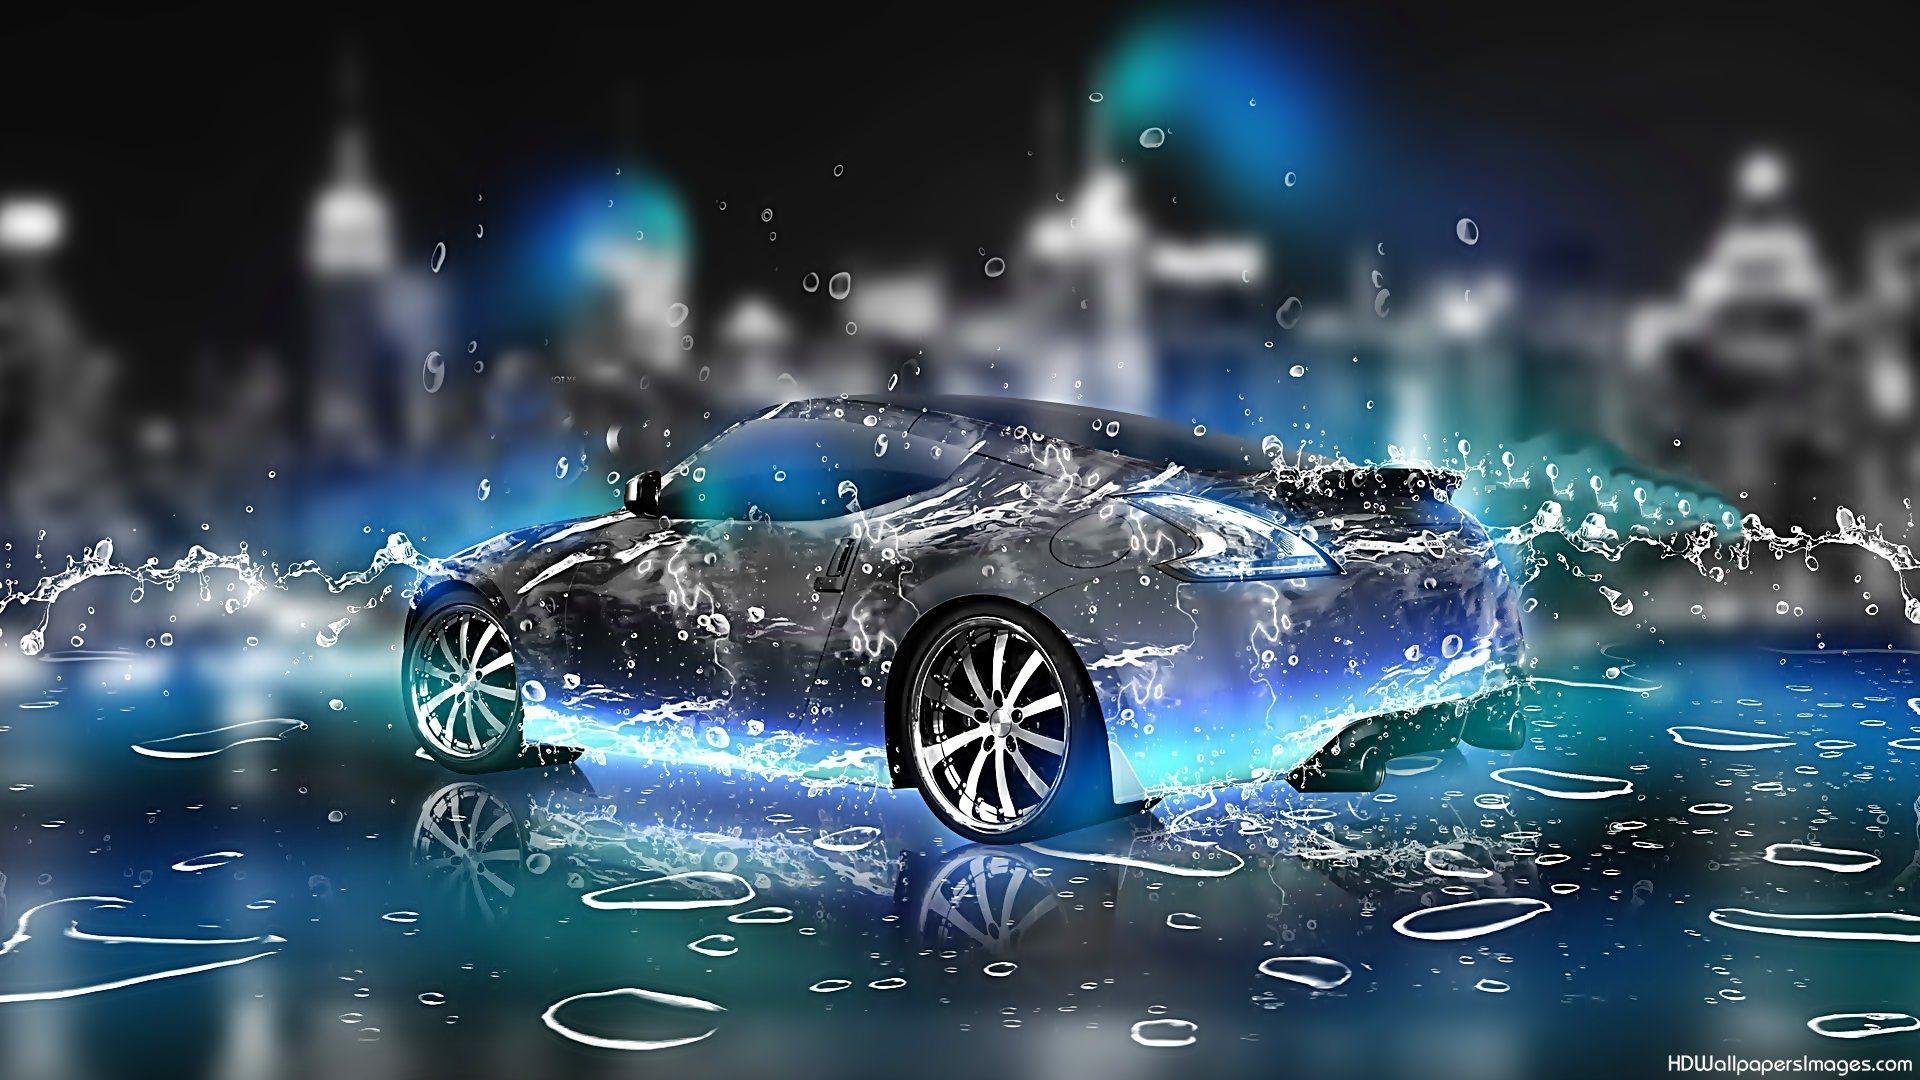 parallax wallpaper,vehicle,car,automotive design,city car,water